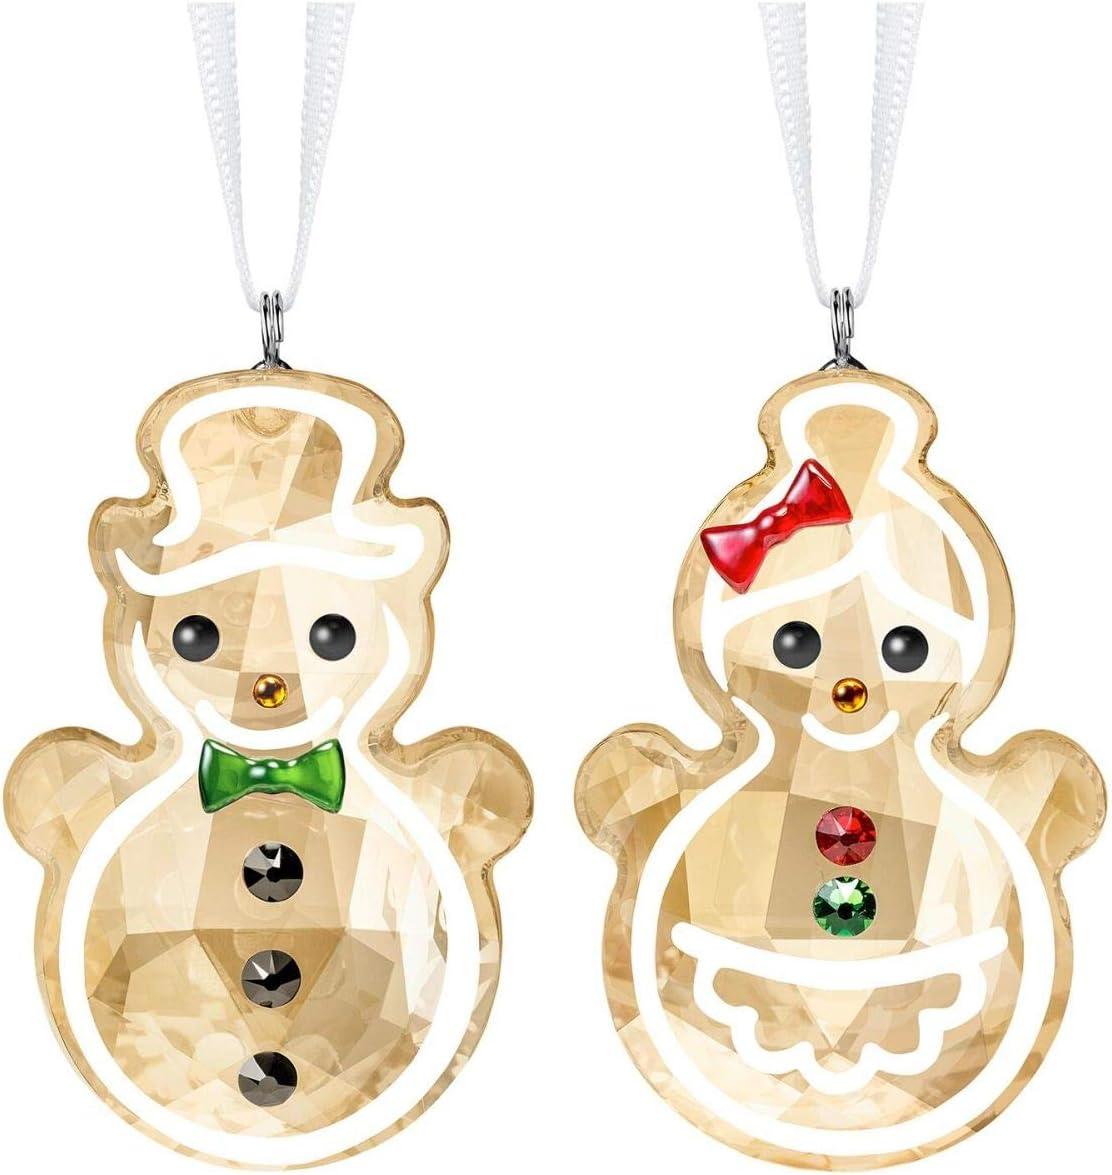 Swarovski Crystal Gingerbread Couple Ornament